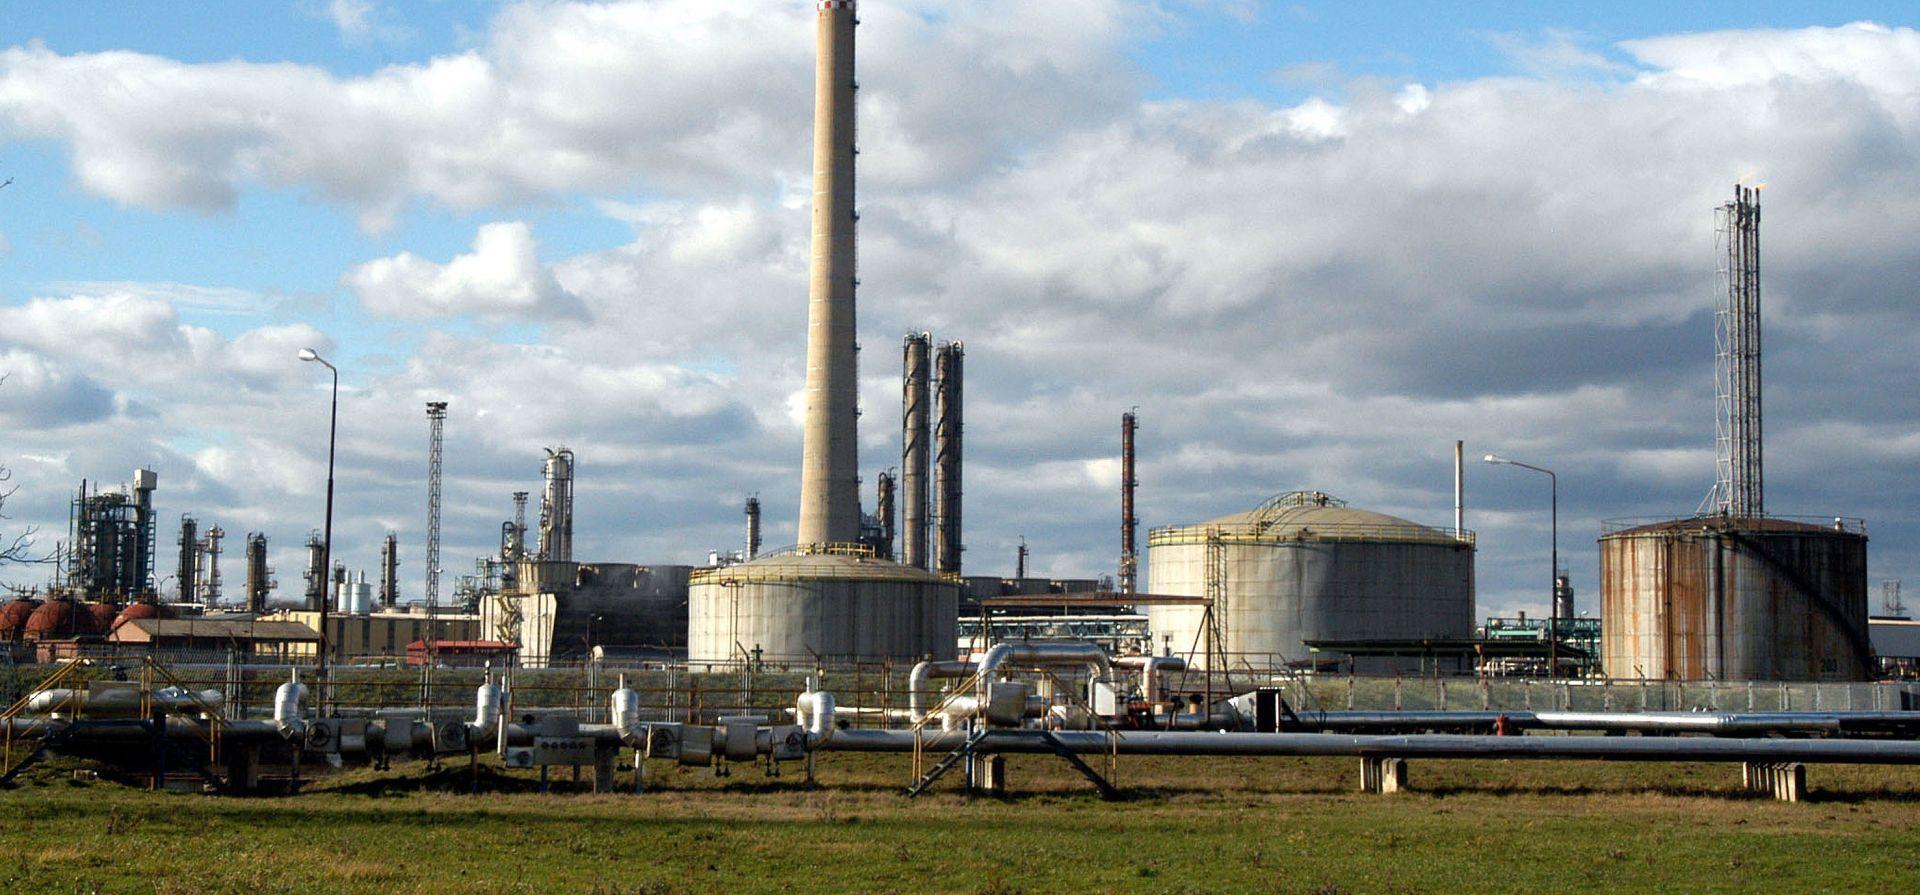 SISAK Dani industrijske baštine od 16. rujna do 1. listopada